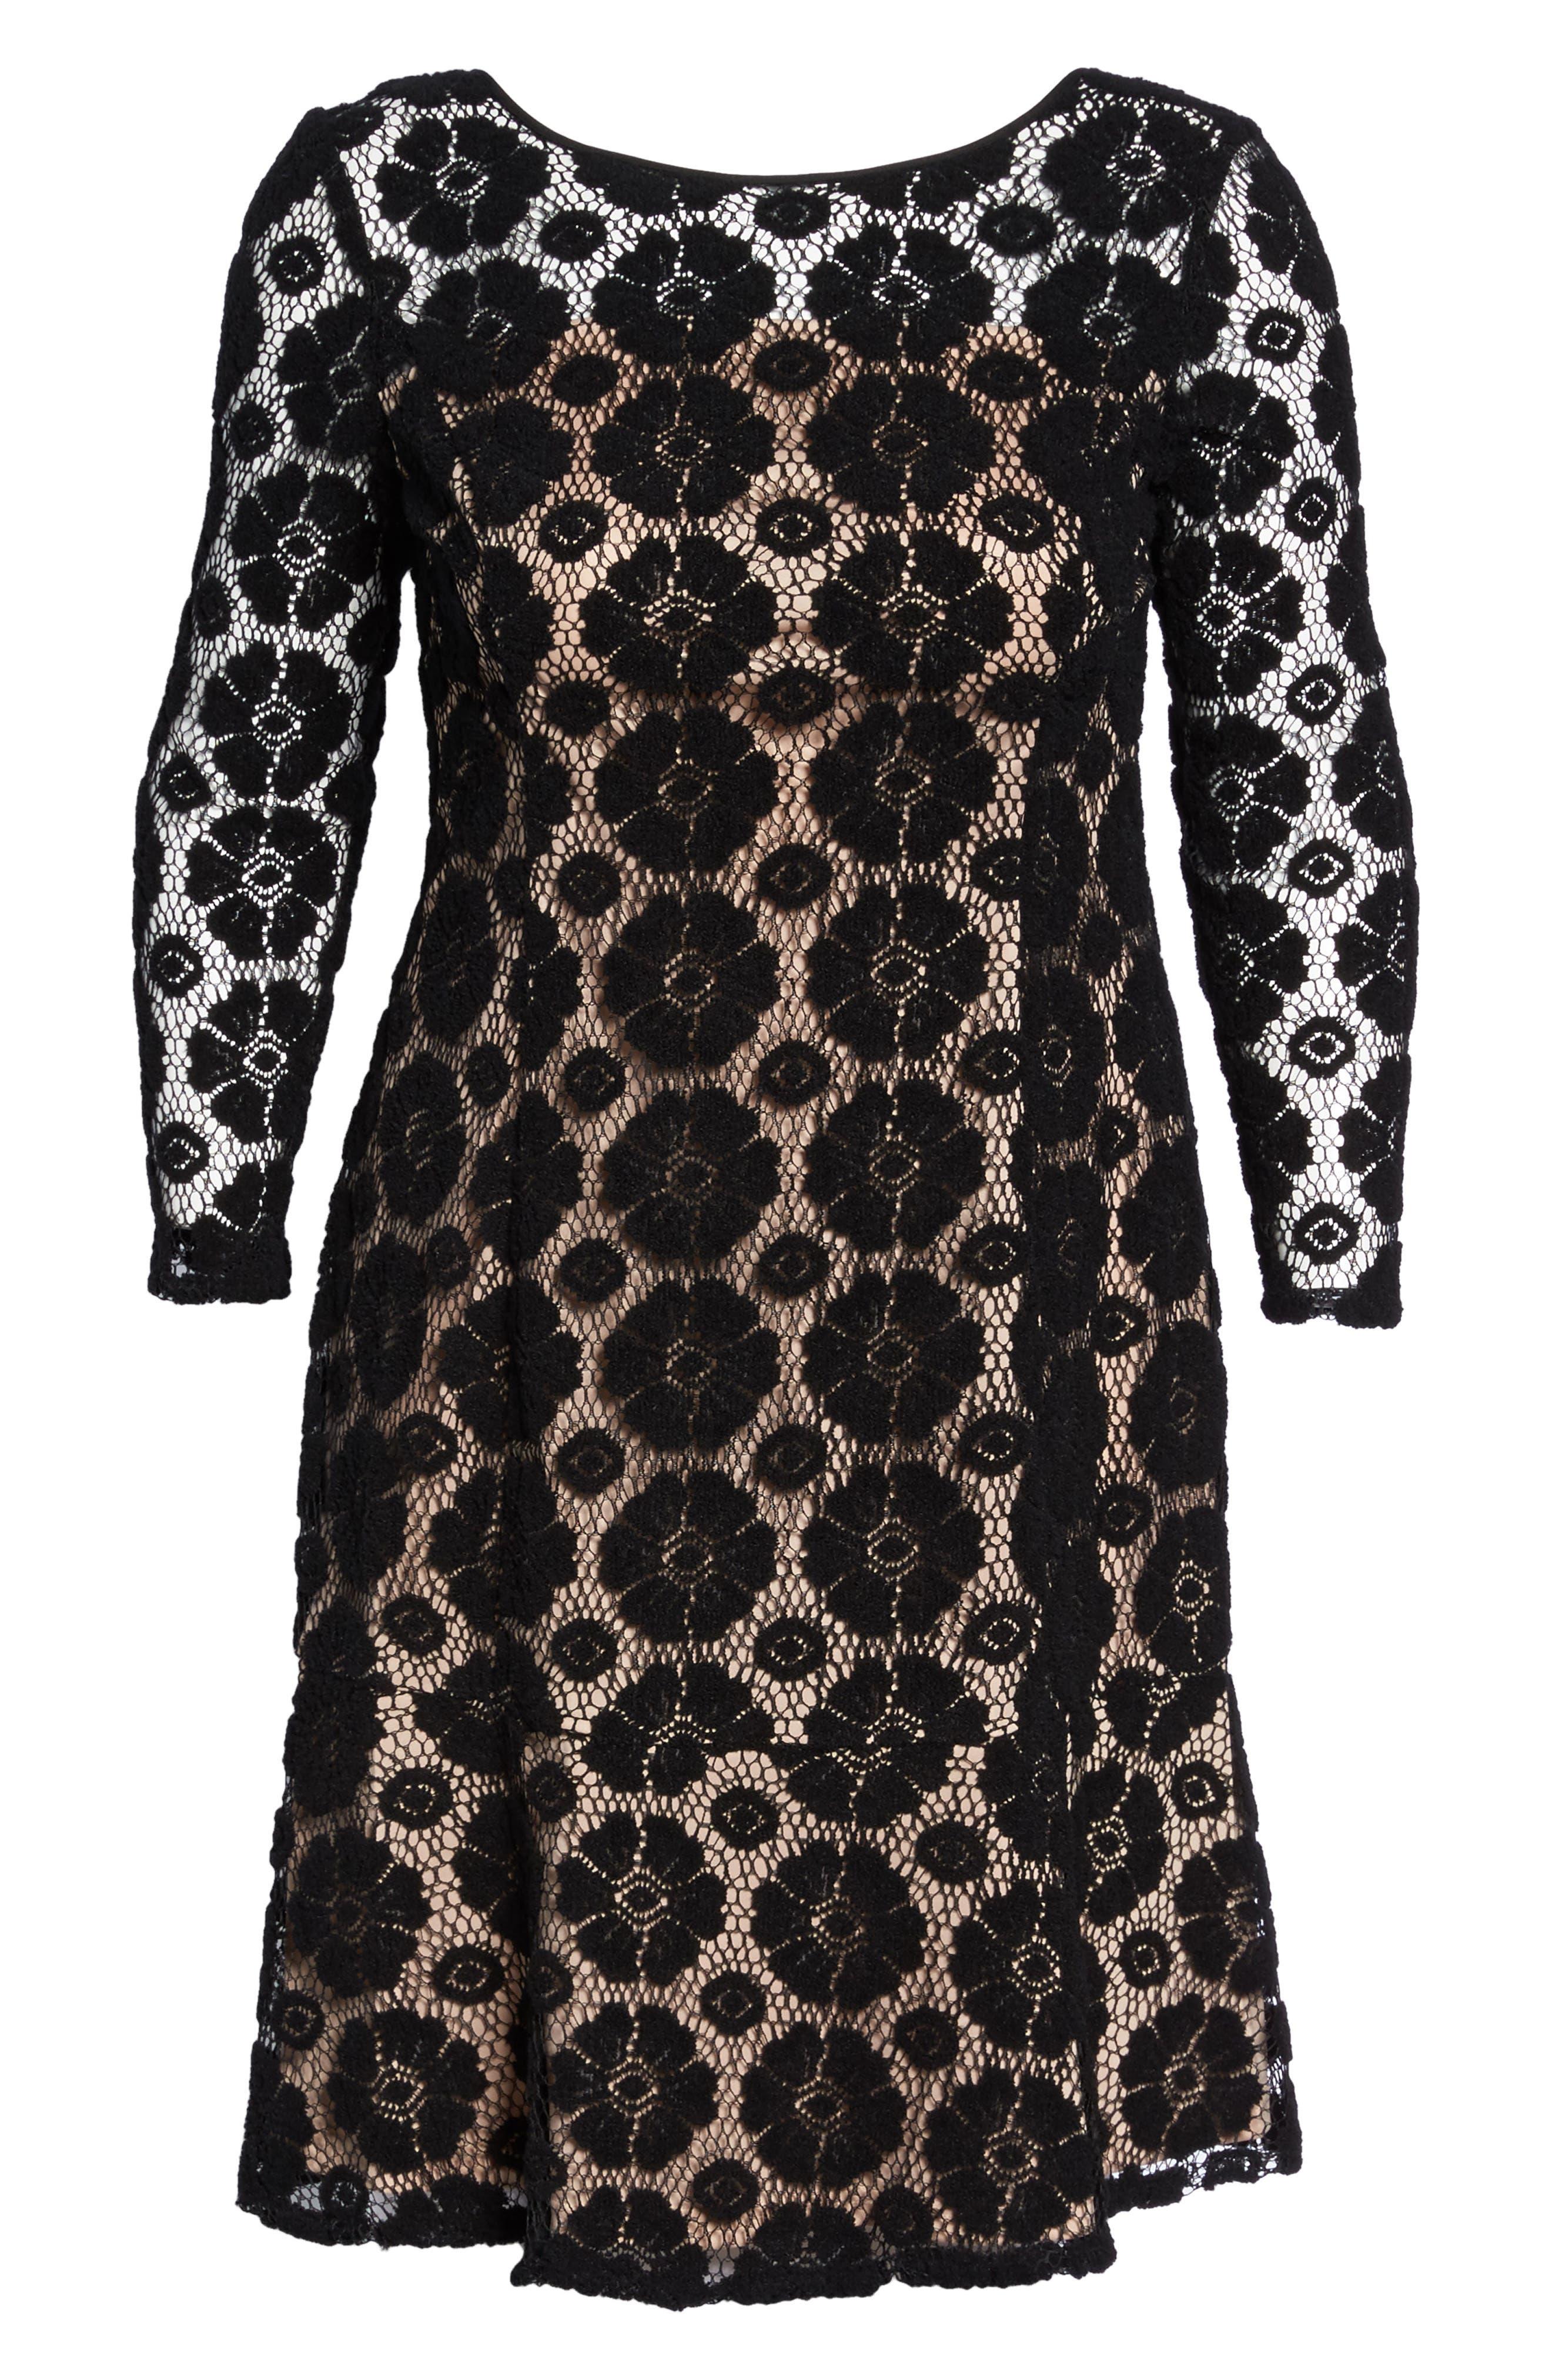 Textured Floral Lace Shift Dress,                             Alternate thumbnail 6, color,